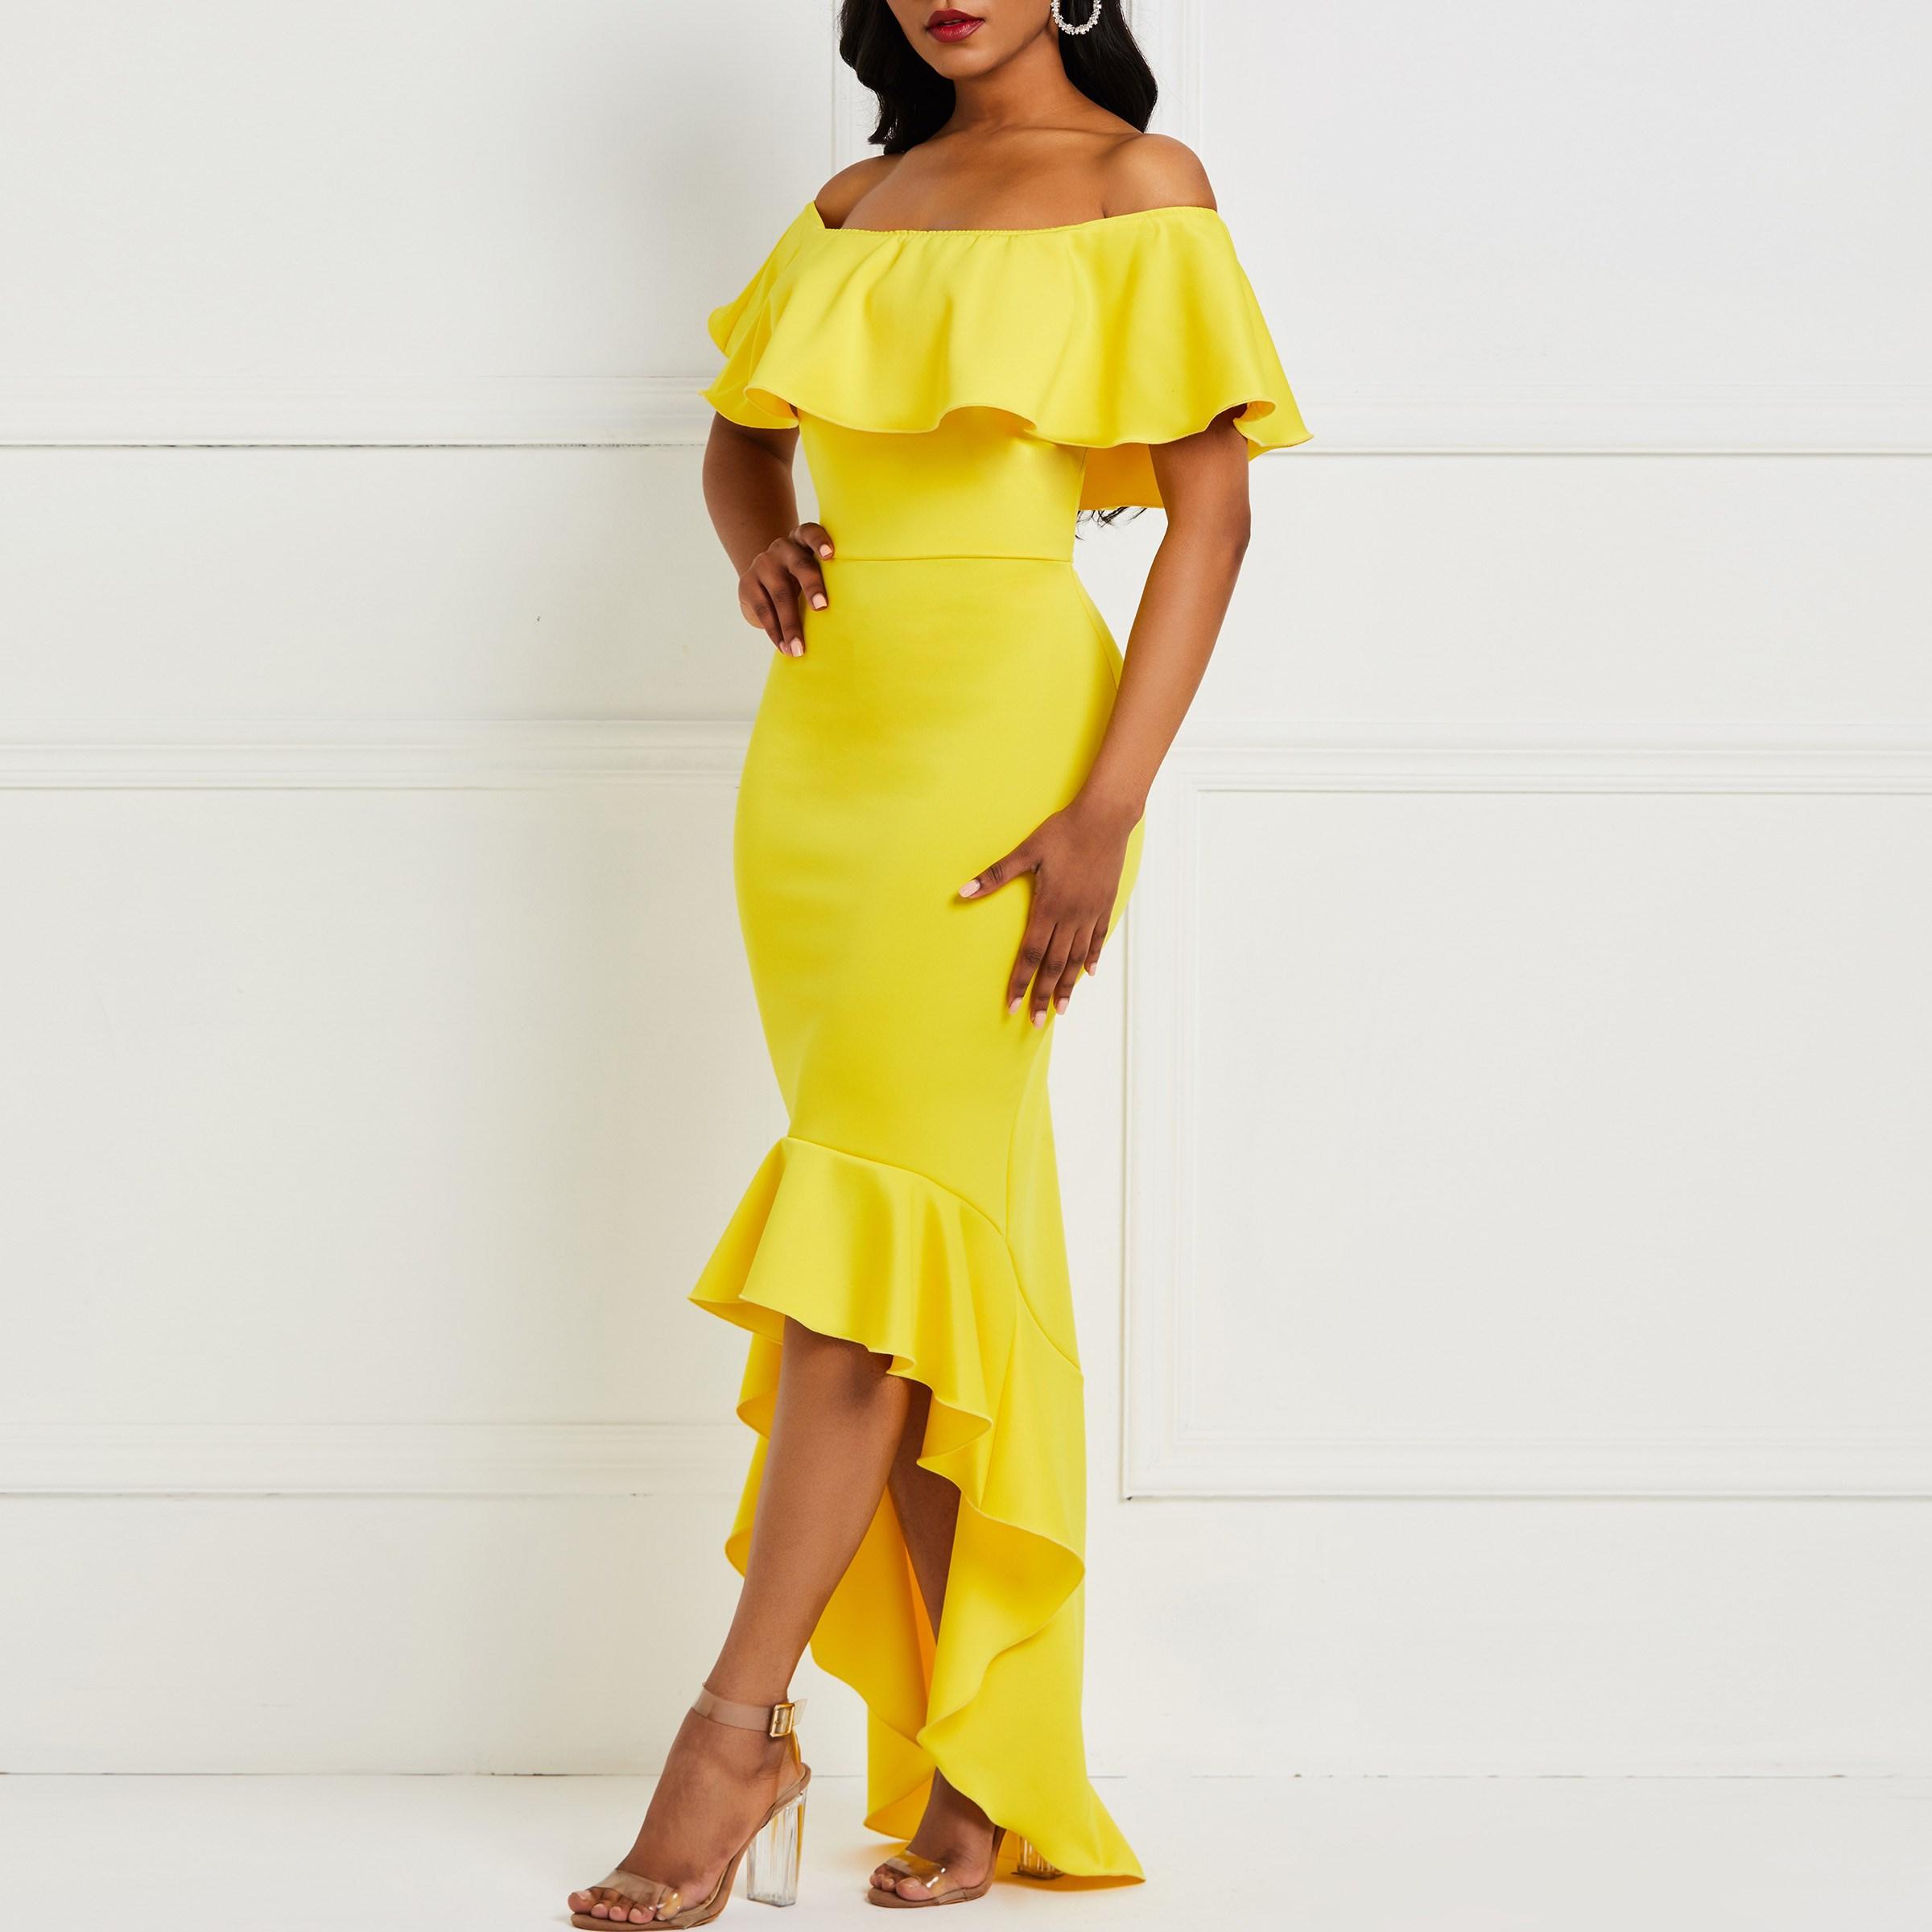 2019 Elegant Party Ruffle Maxi Dress Women Beach Yellow High Waist Asymmetric Dress Female Ol Strapless Sexy Long Dress in Dresses from Women 39 s Clothing